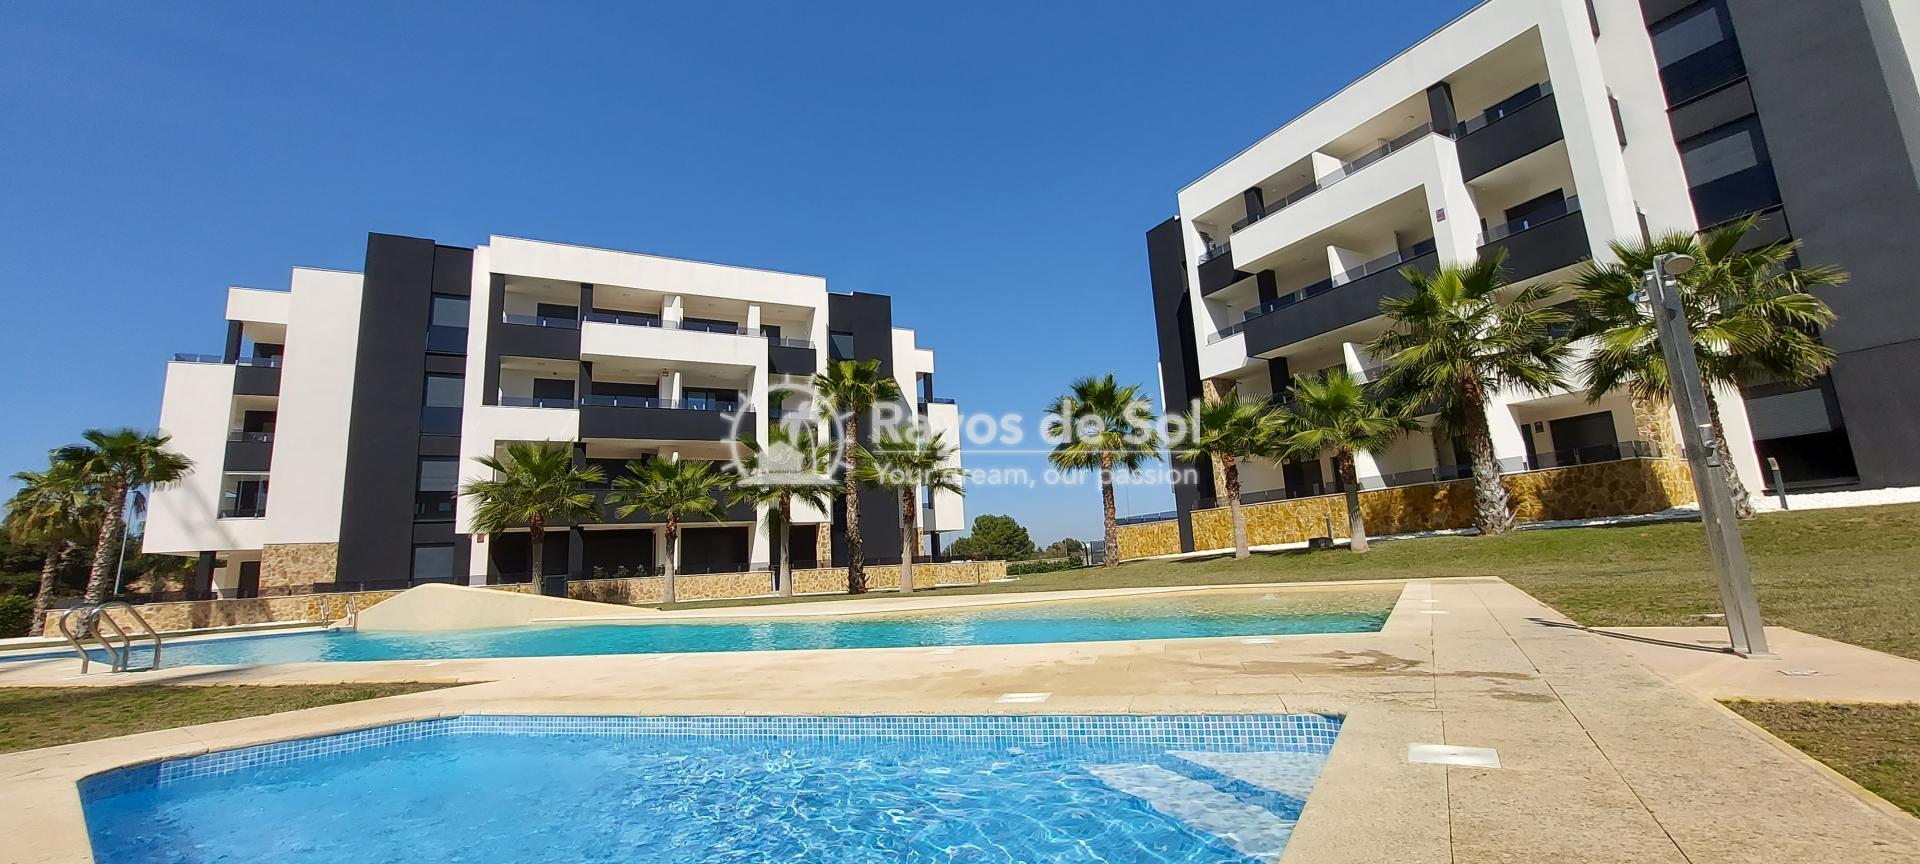 Apartment ground floor  in Orihuela Costa, Costa Blanca (amanecer6-gf-3d) - 1